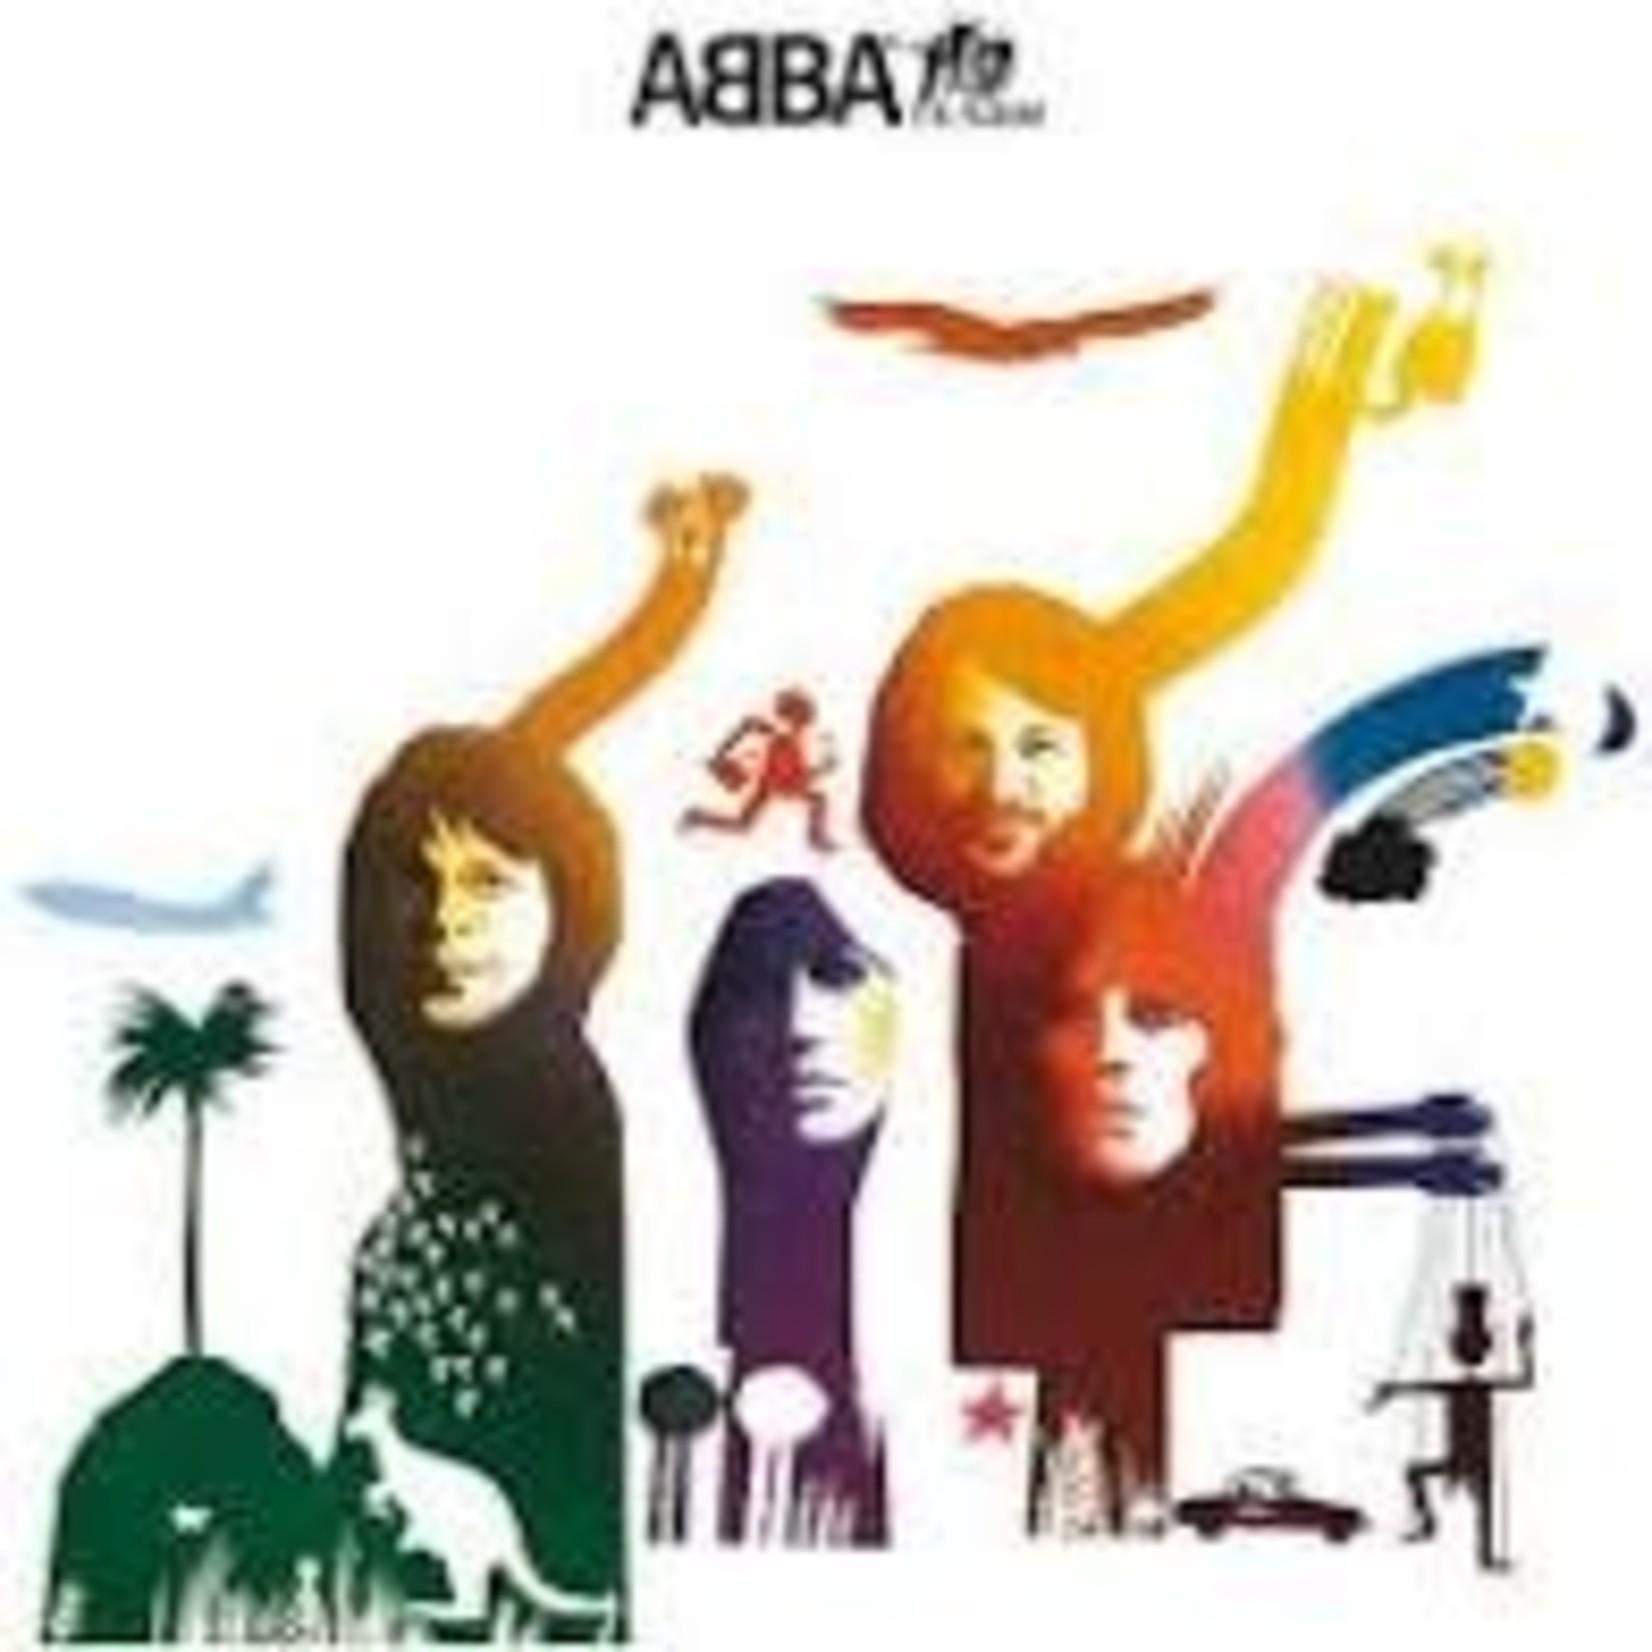 ABBA - THE ALBUM (VINYL)